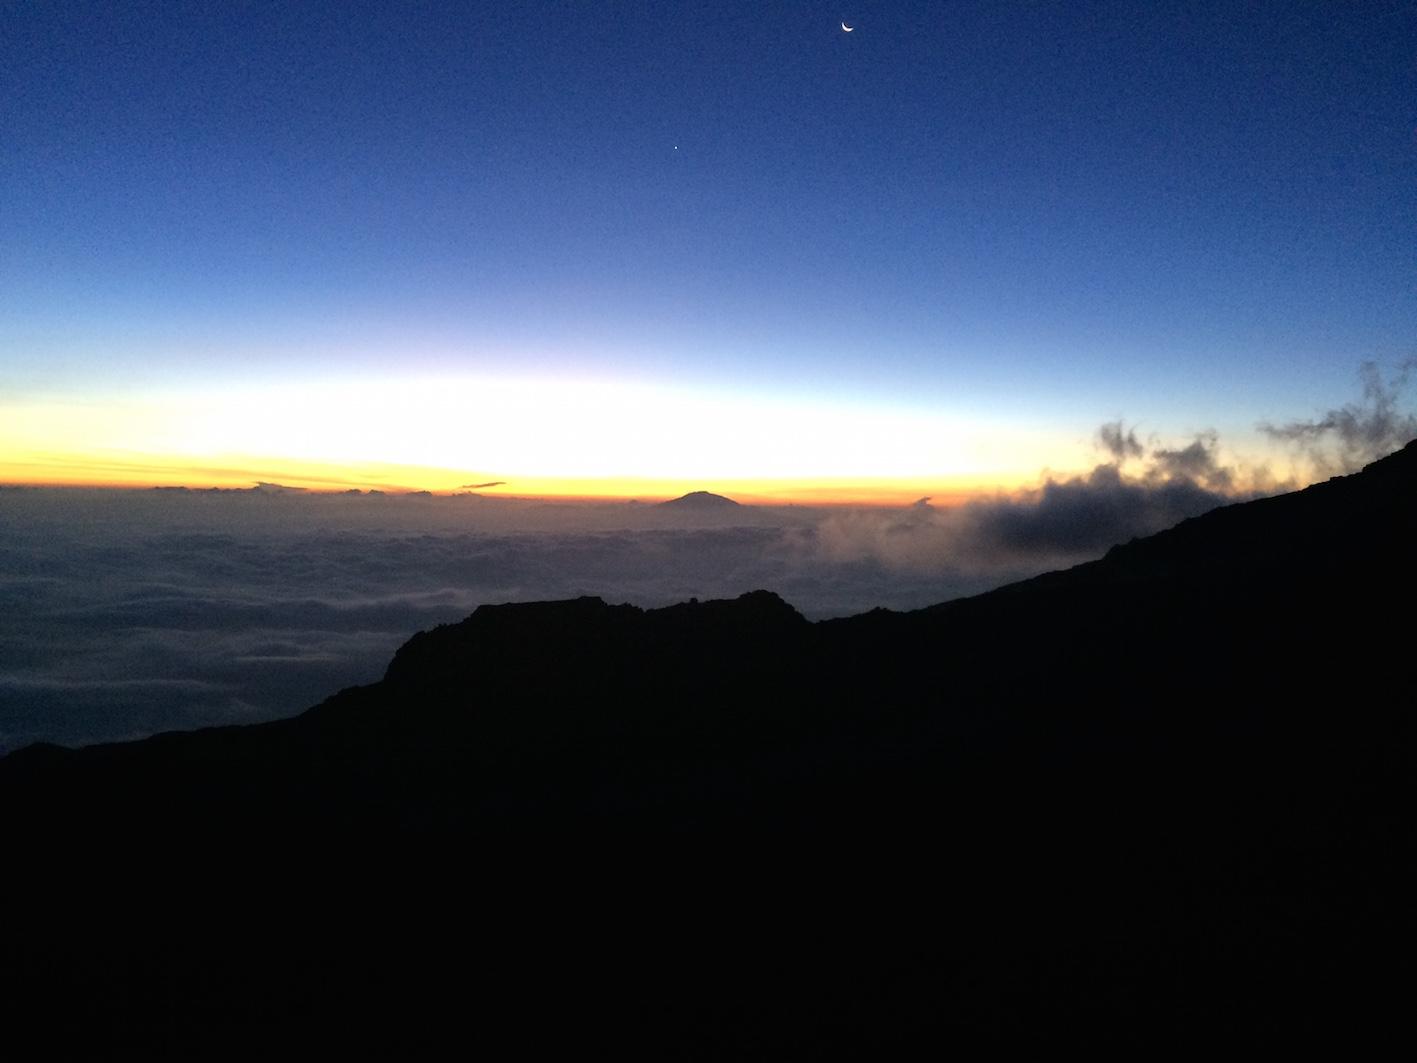 kilimanjaro-solnedgång-bla-himmel